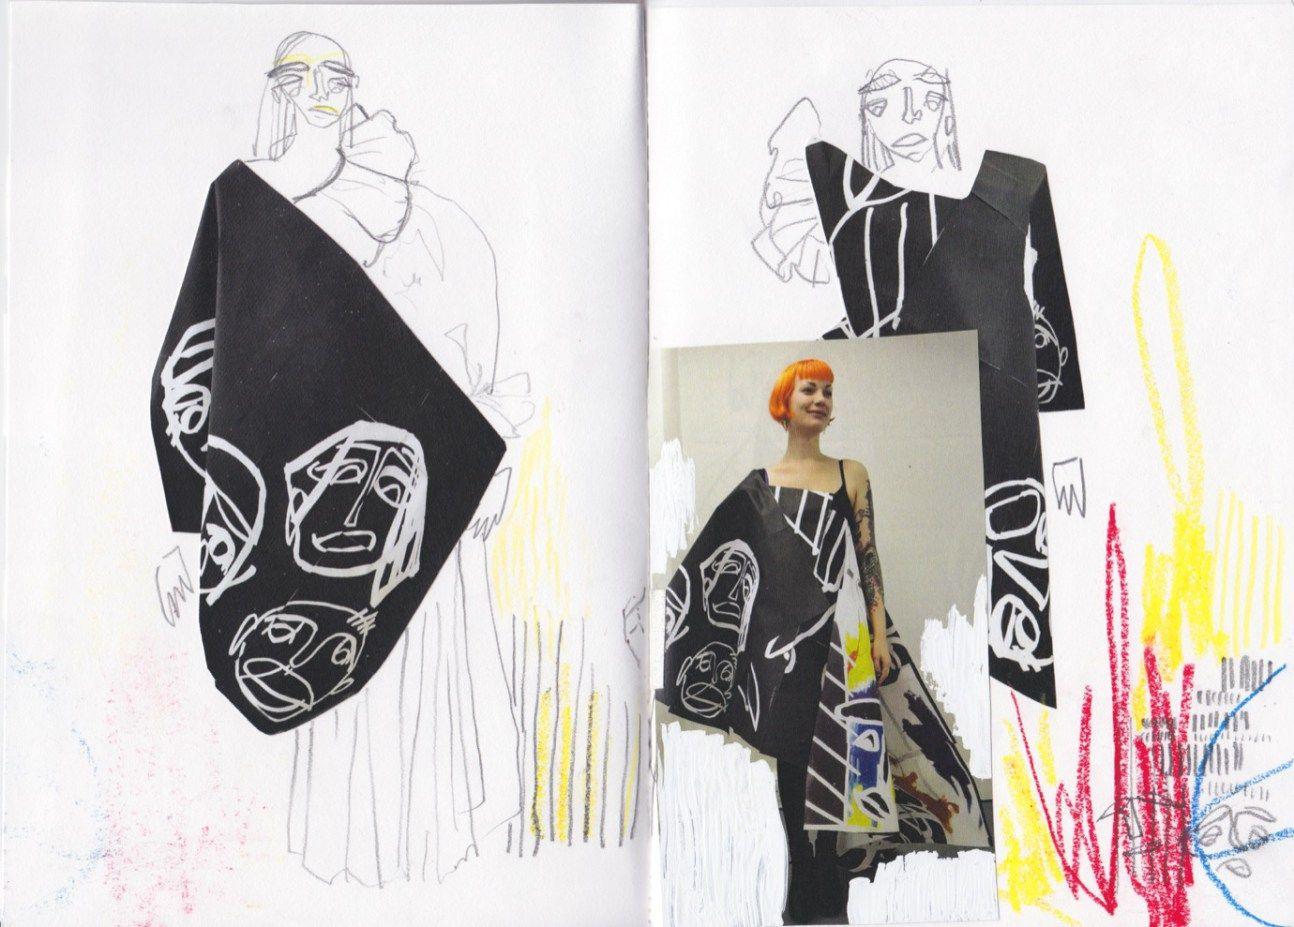 Fashion - Beyond Material